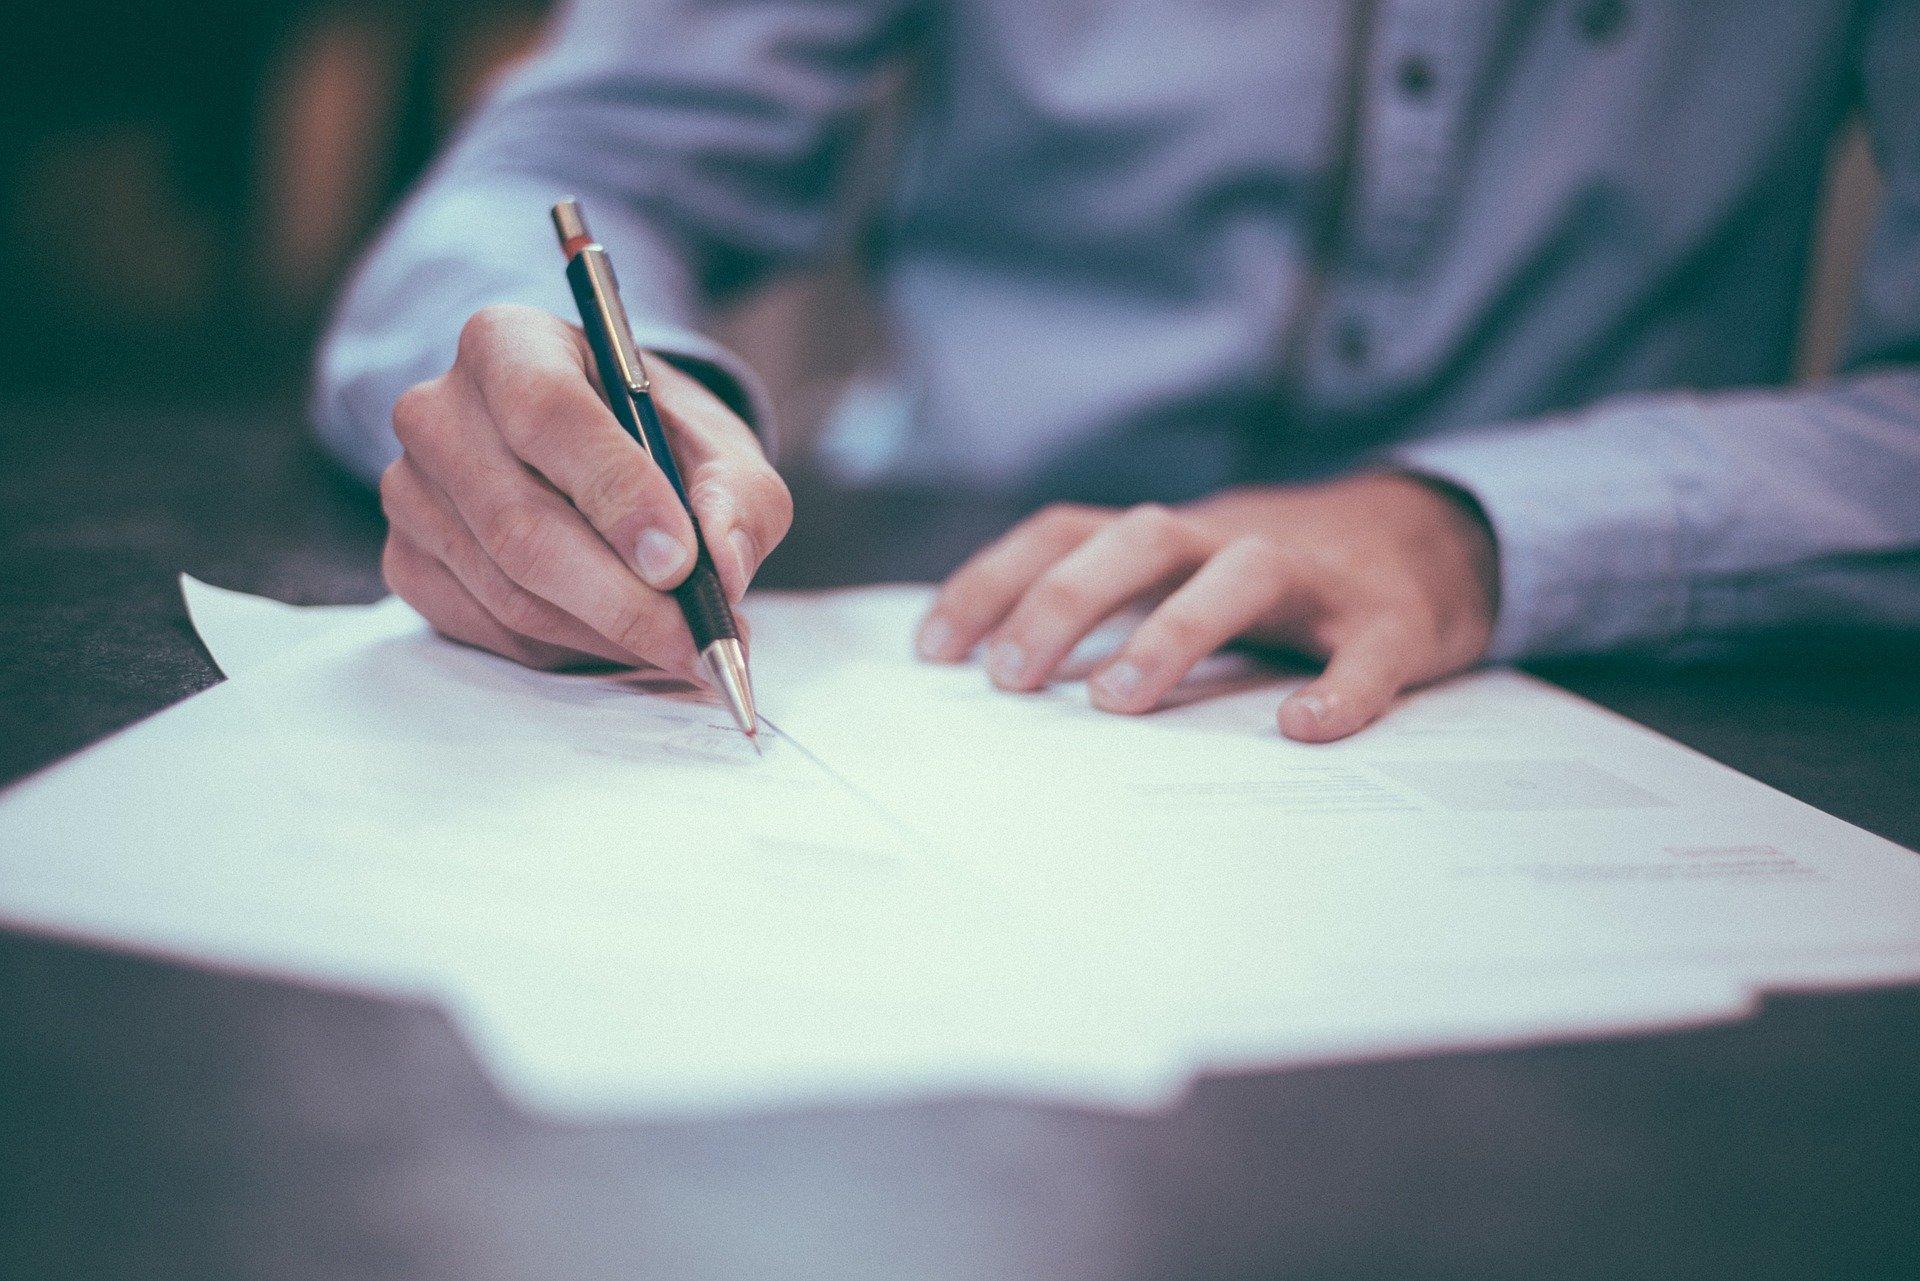 Man signing papers.     Photo: Pixabay